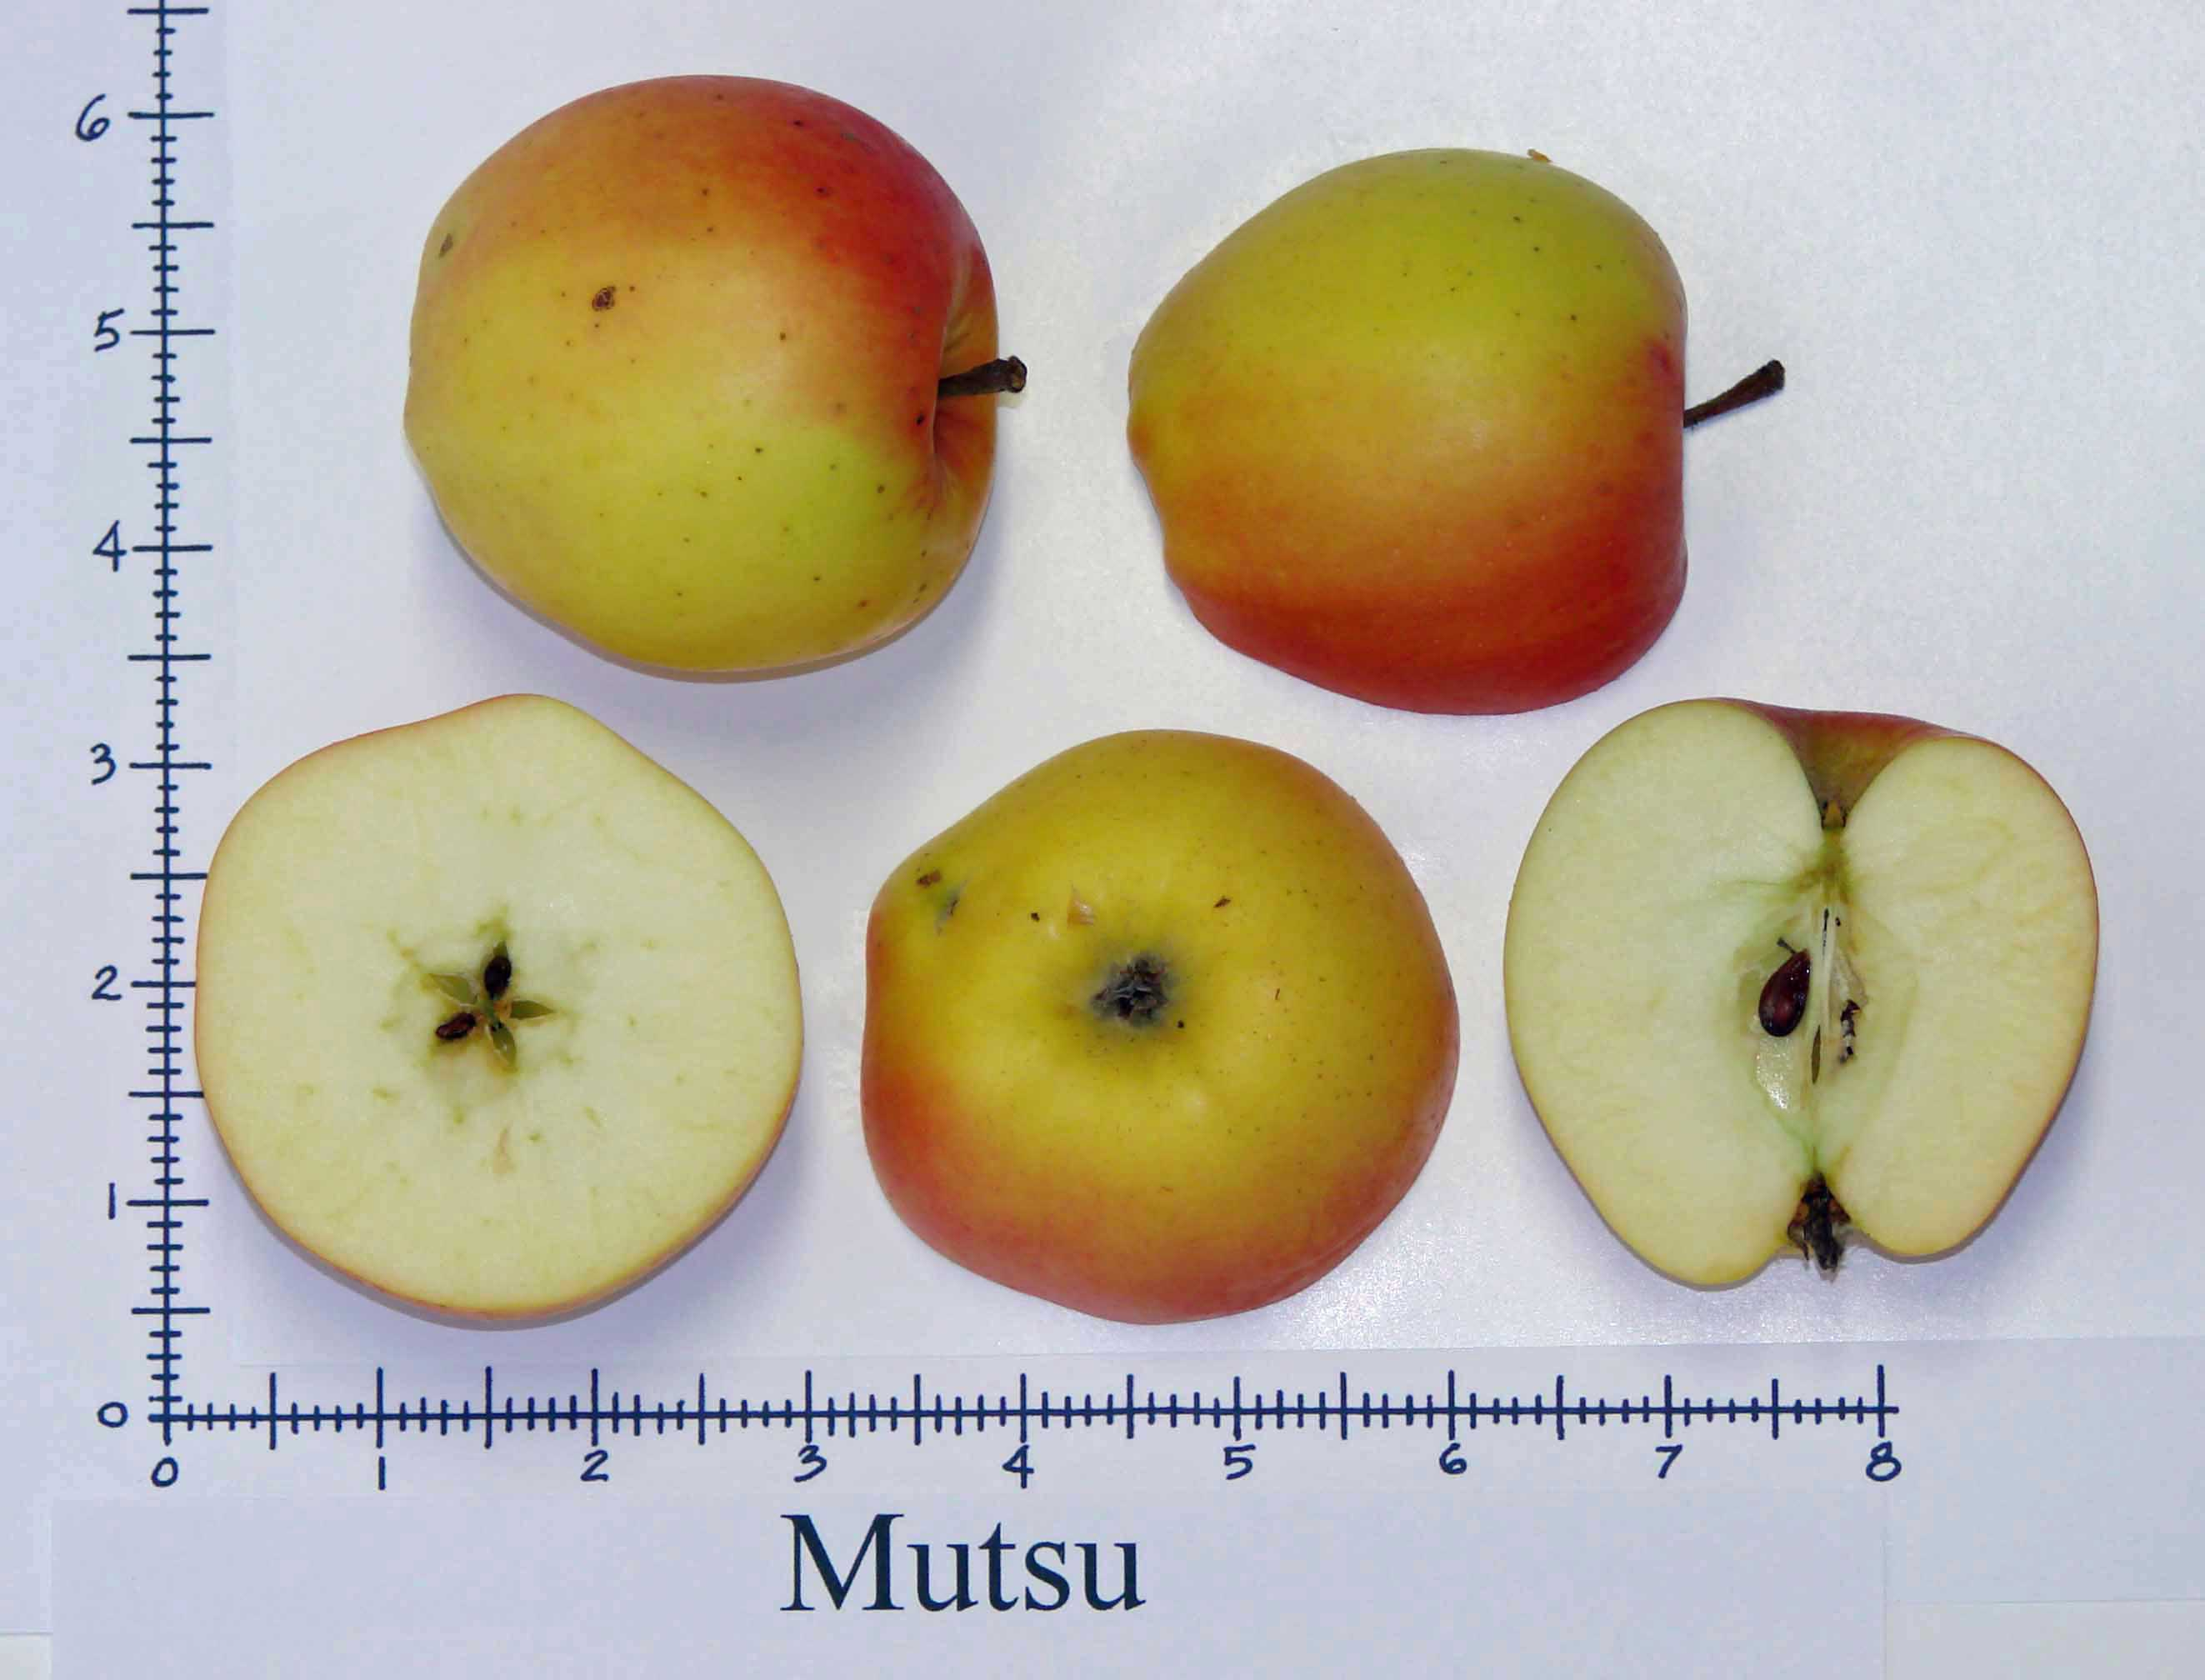 Mutsu (Crispin)